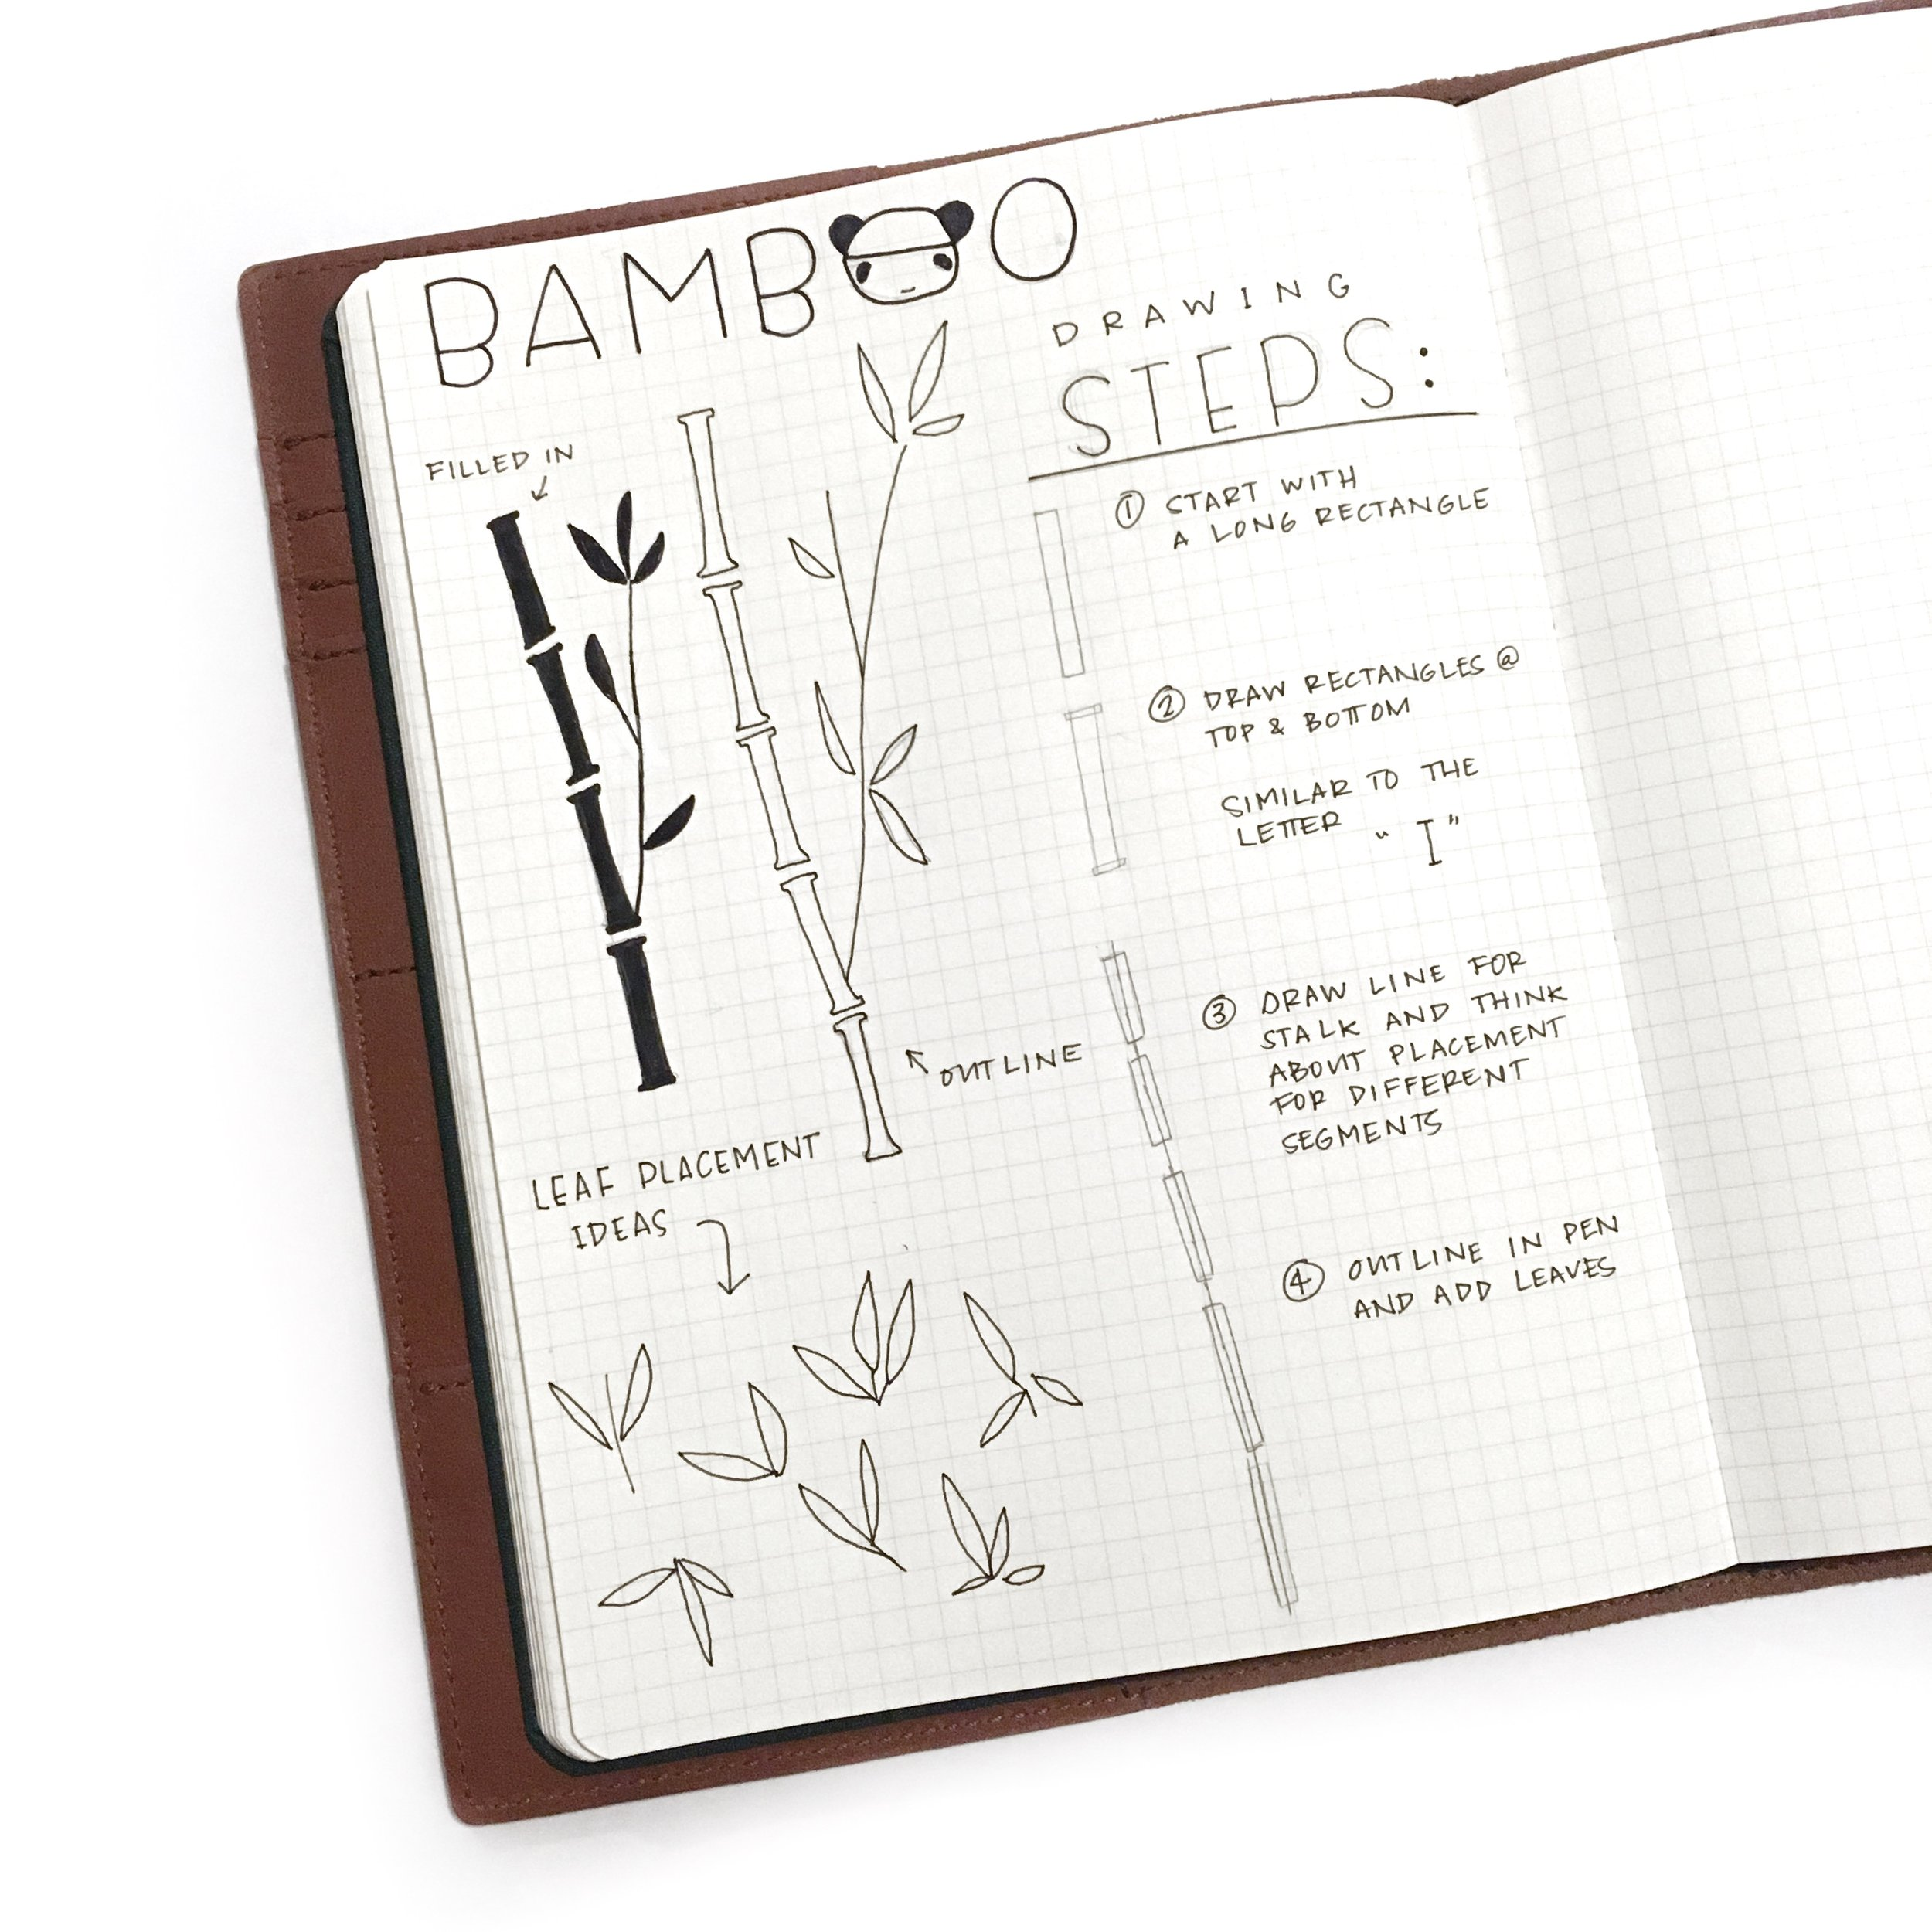 inkbyjeng_bamboo_drawing_tutorial.jpg